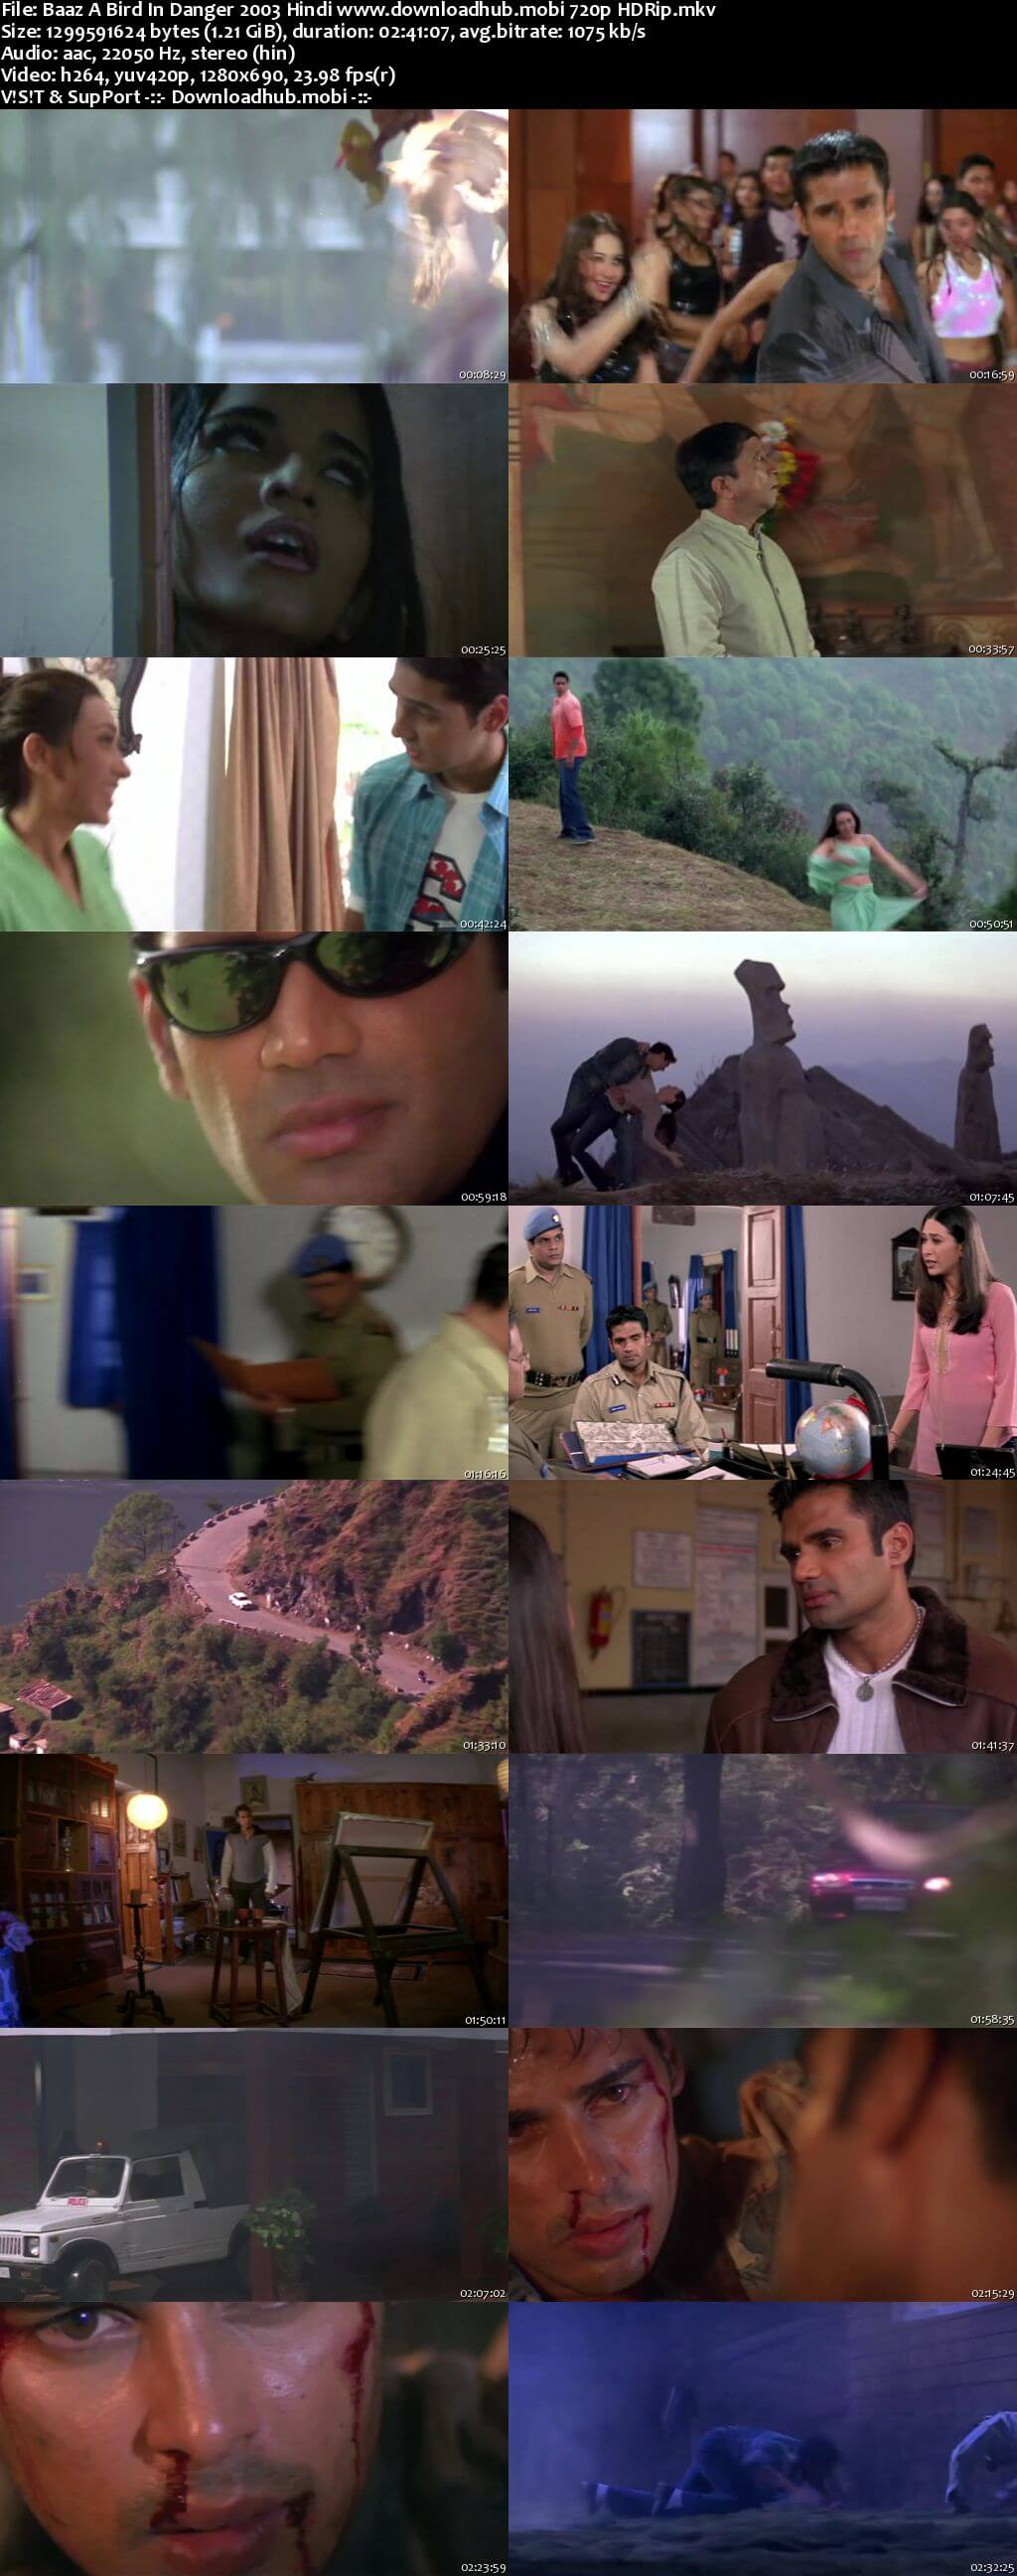 Baaz A Bird in Danger 2003 Hindi 720p HDRip x264